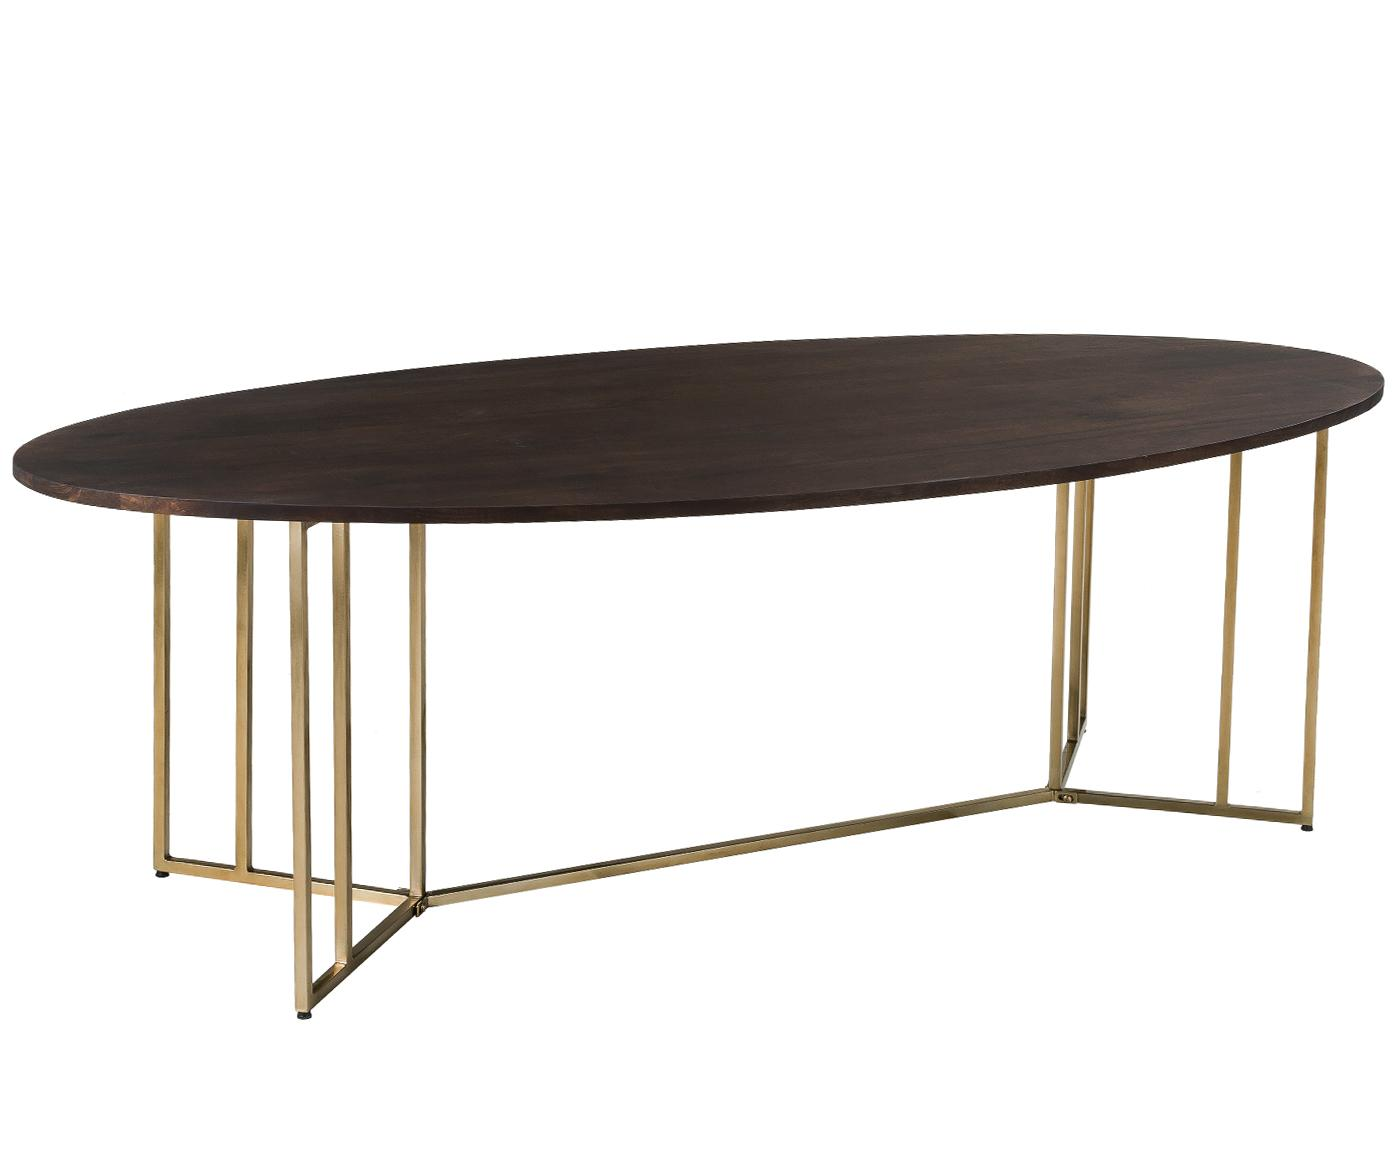 Ovale massiefhouten eettafel Luca, Tafelblad: mangohout, Frame: gecoat metaal, Tafelblad: donker gelakt mangohout. Frame: goudkleurig, B 240 x D 100 cm